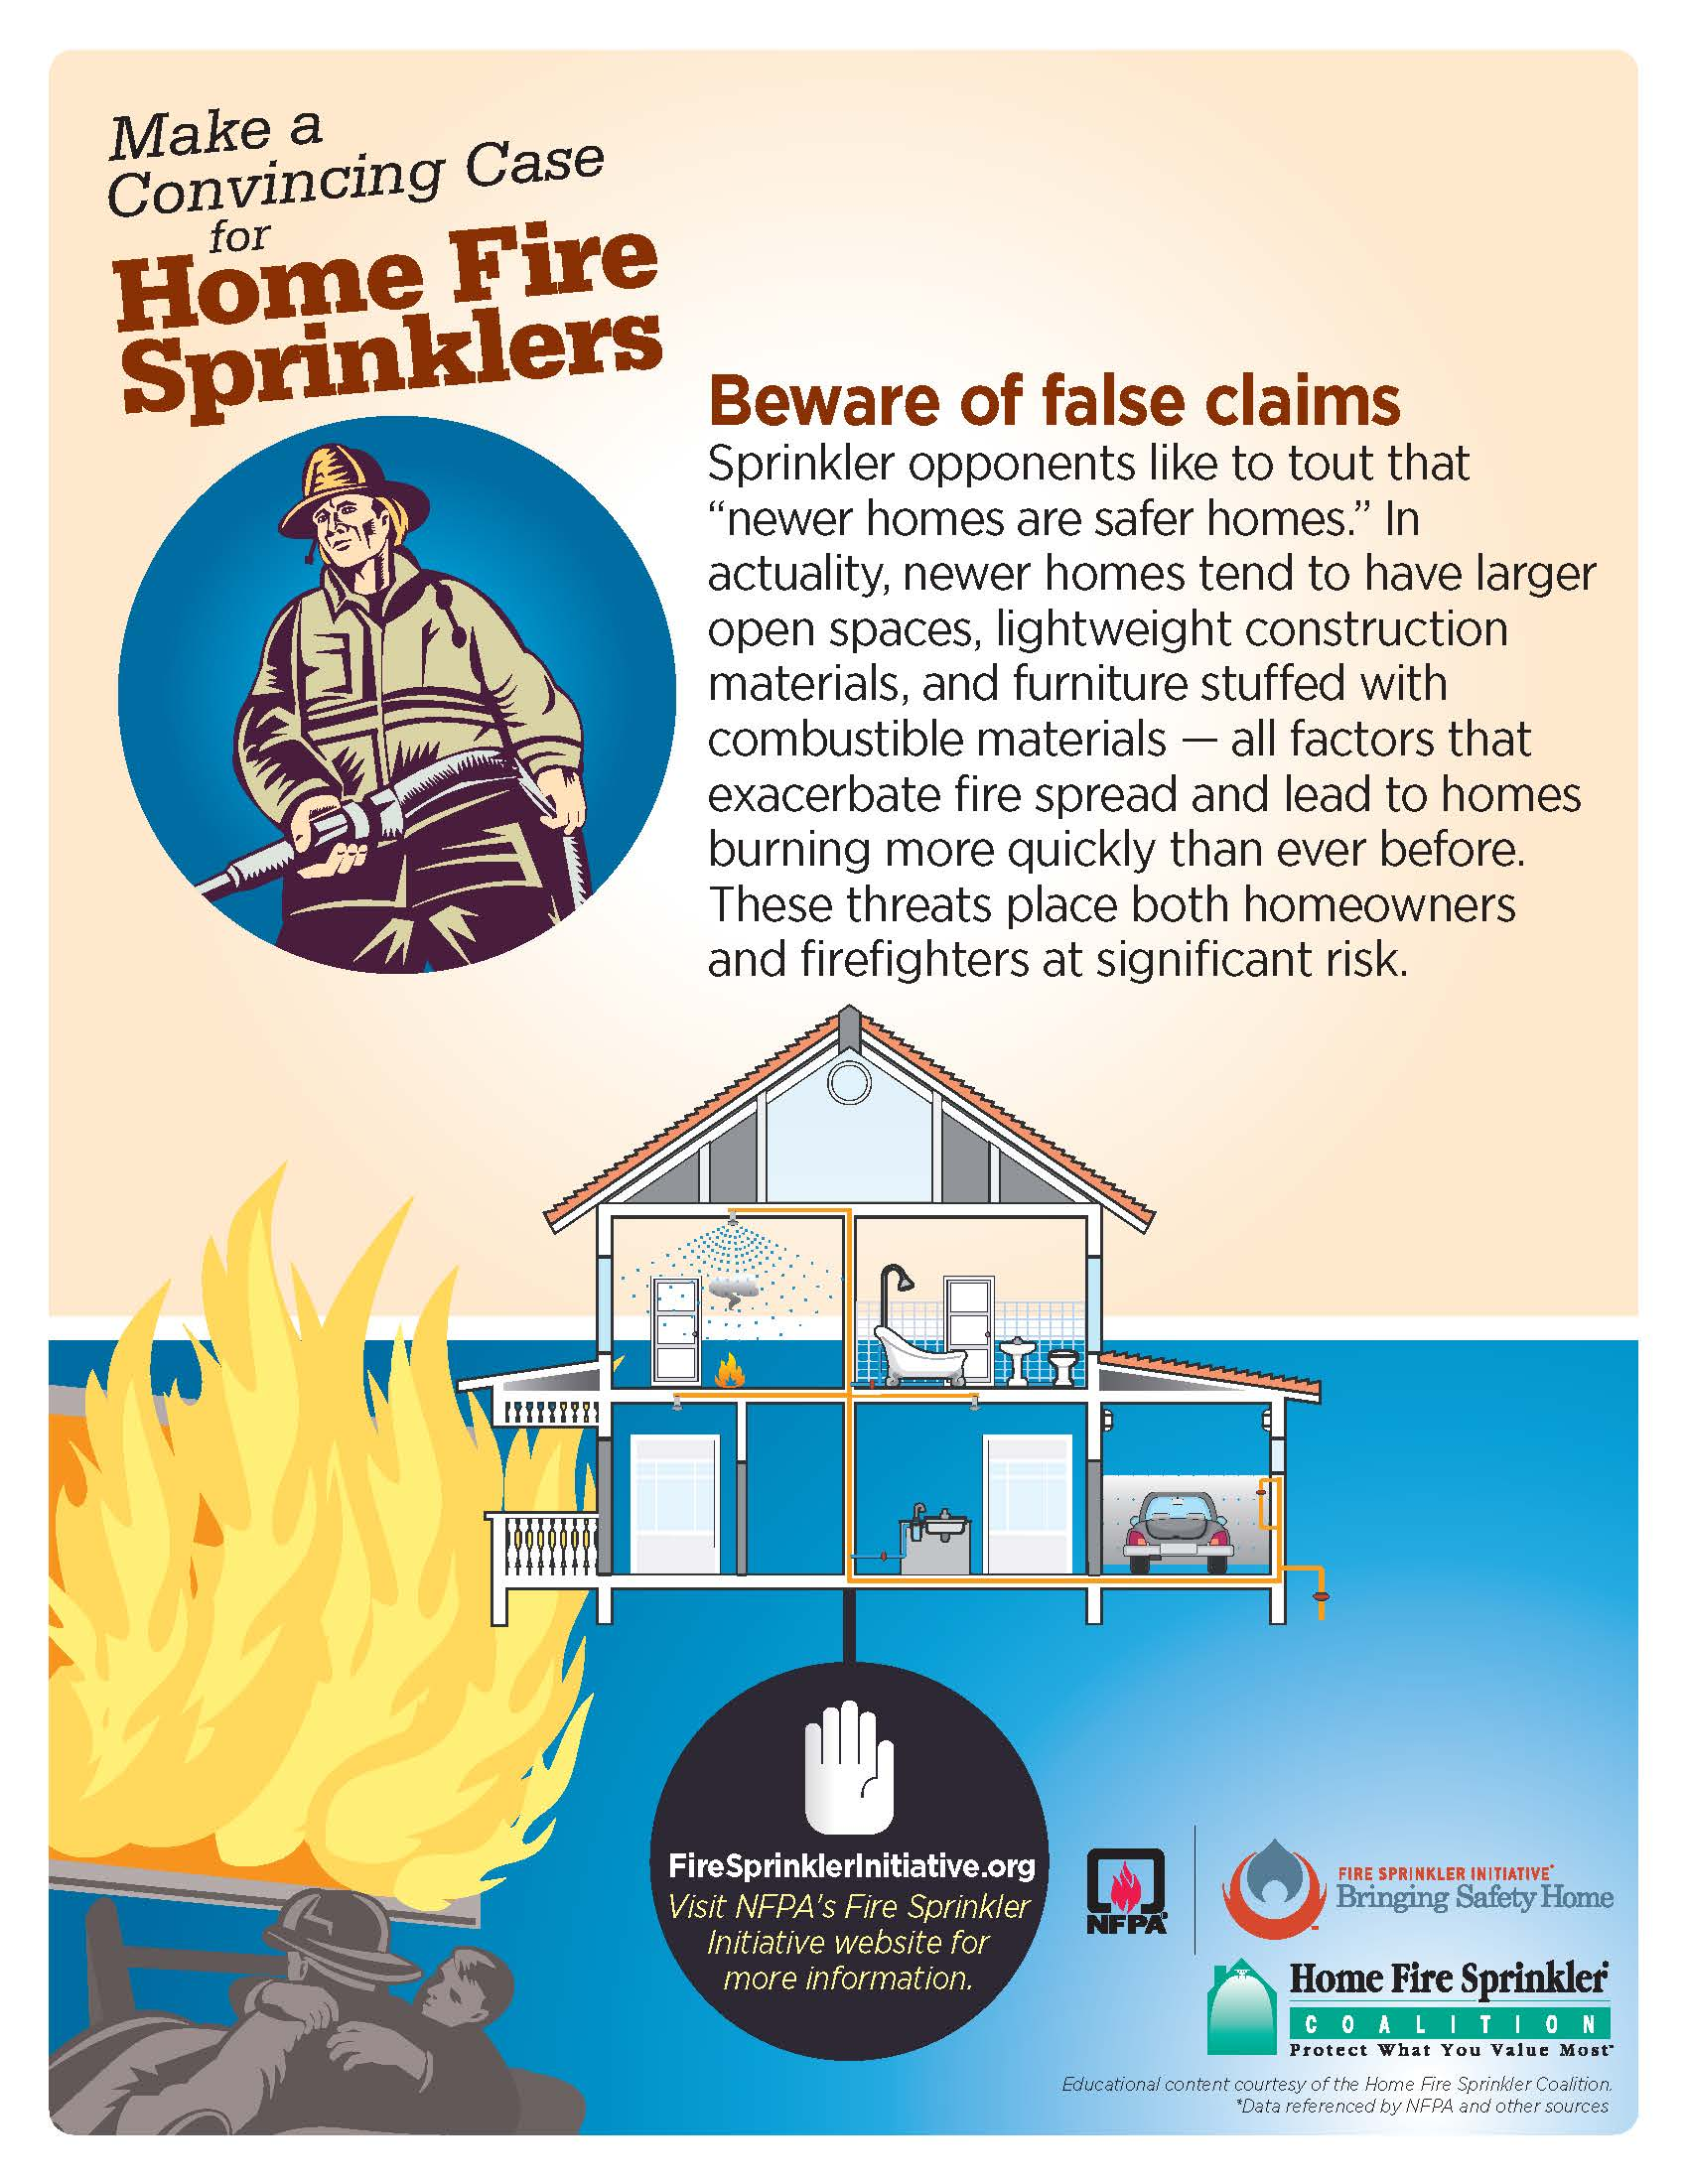 NFPA's Fire Sprinkler Initiative-Free downloads